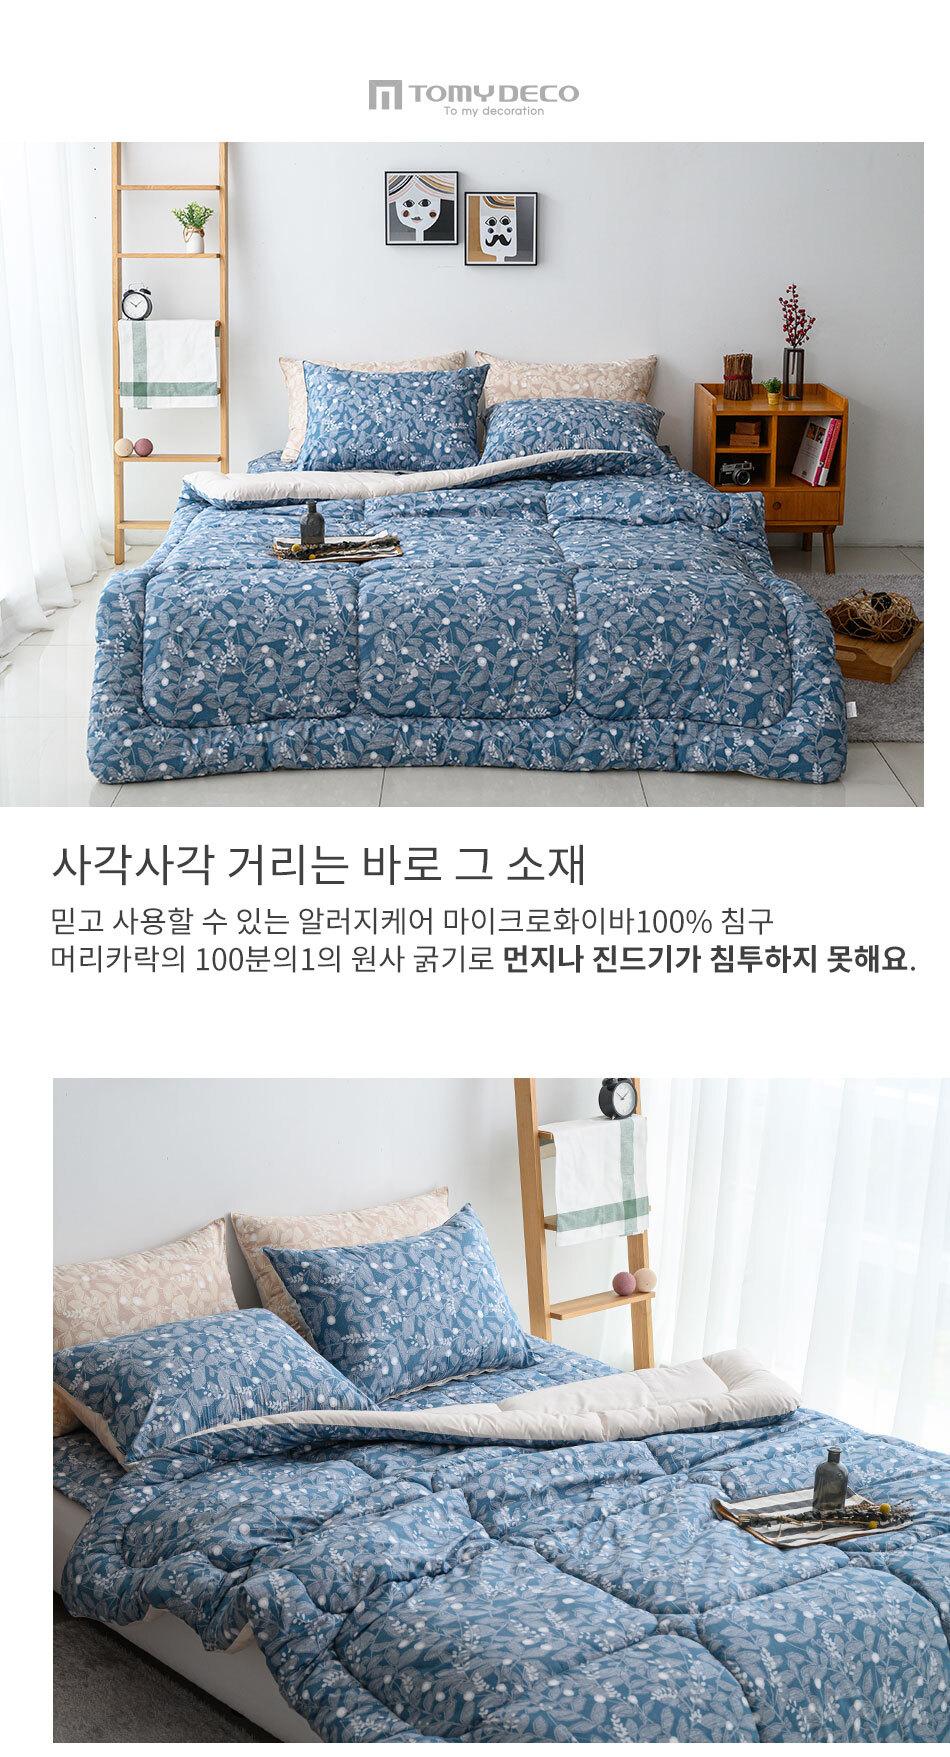 kassy_bed_blue_01.jpg